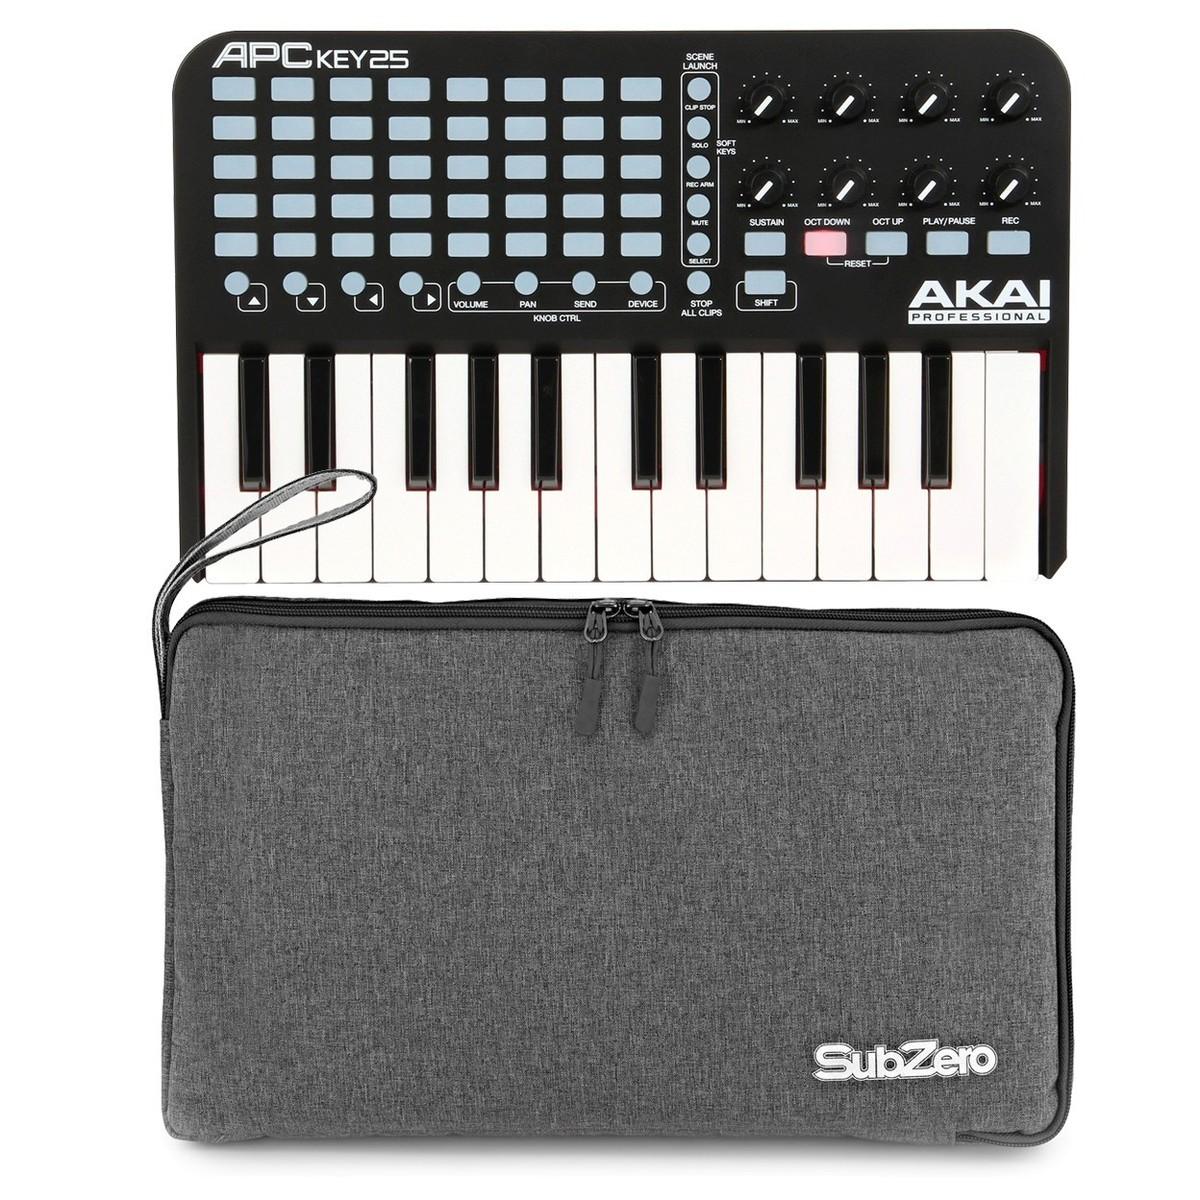 Akai Apc Key 25 Usb Controller With Bag